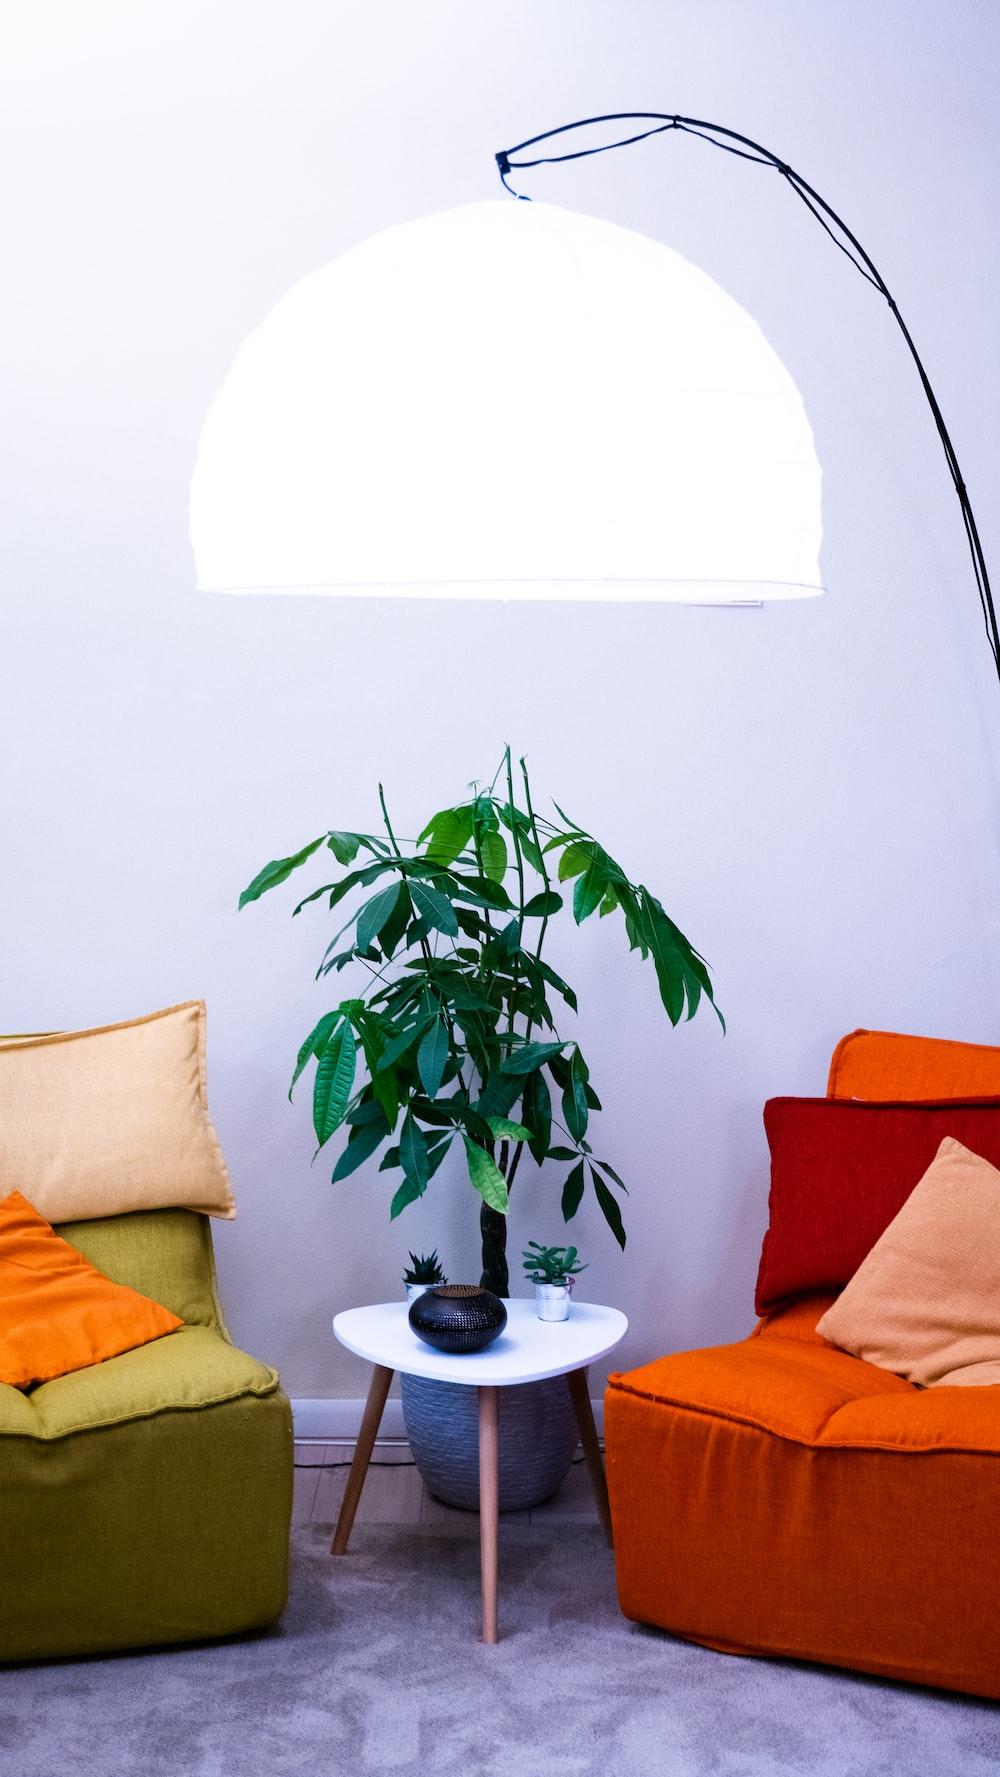 green plant on white ceramic plate